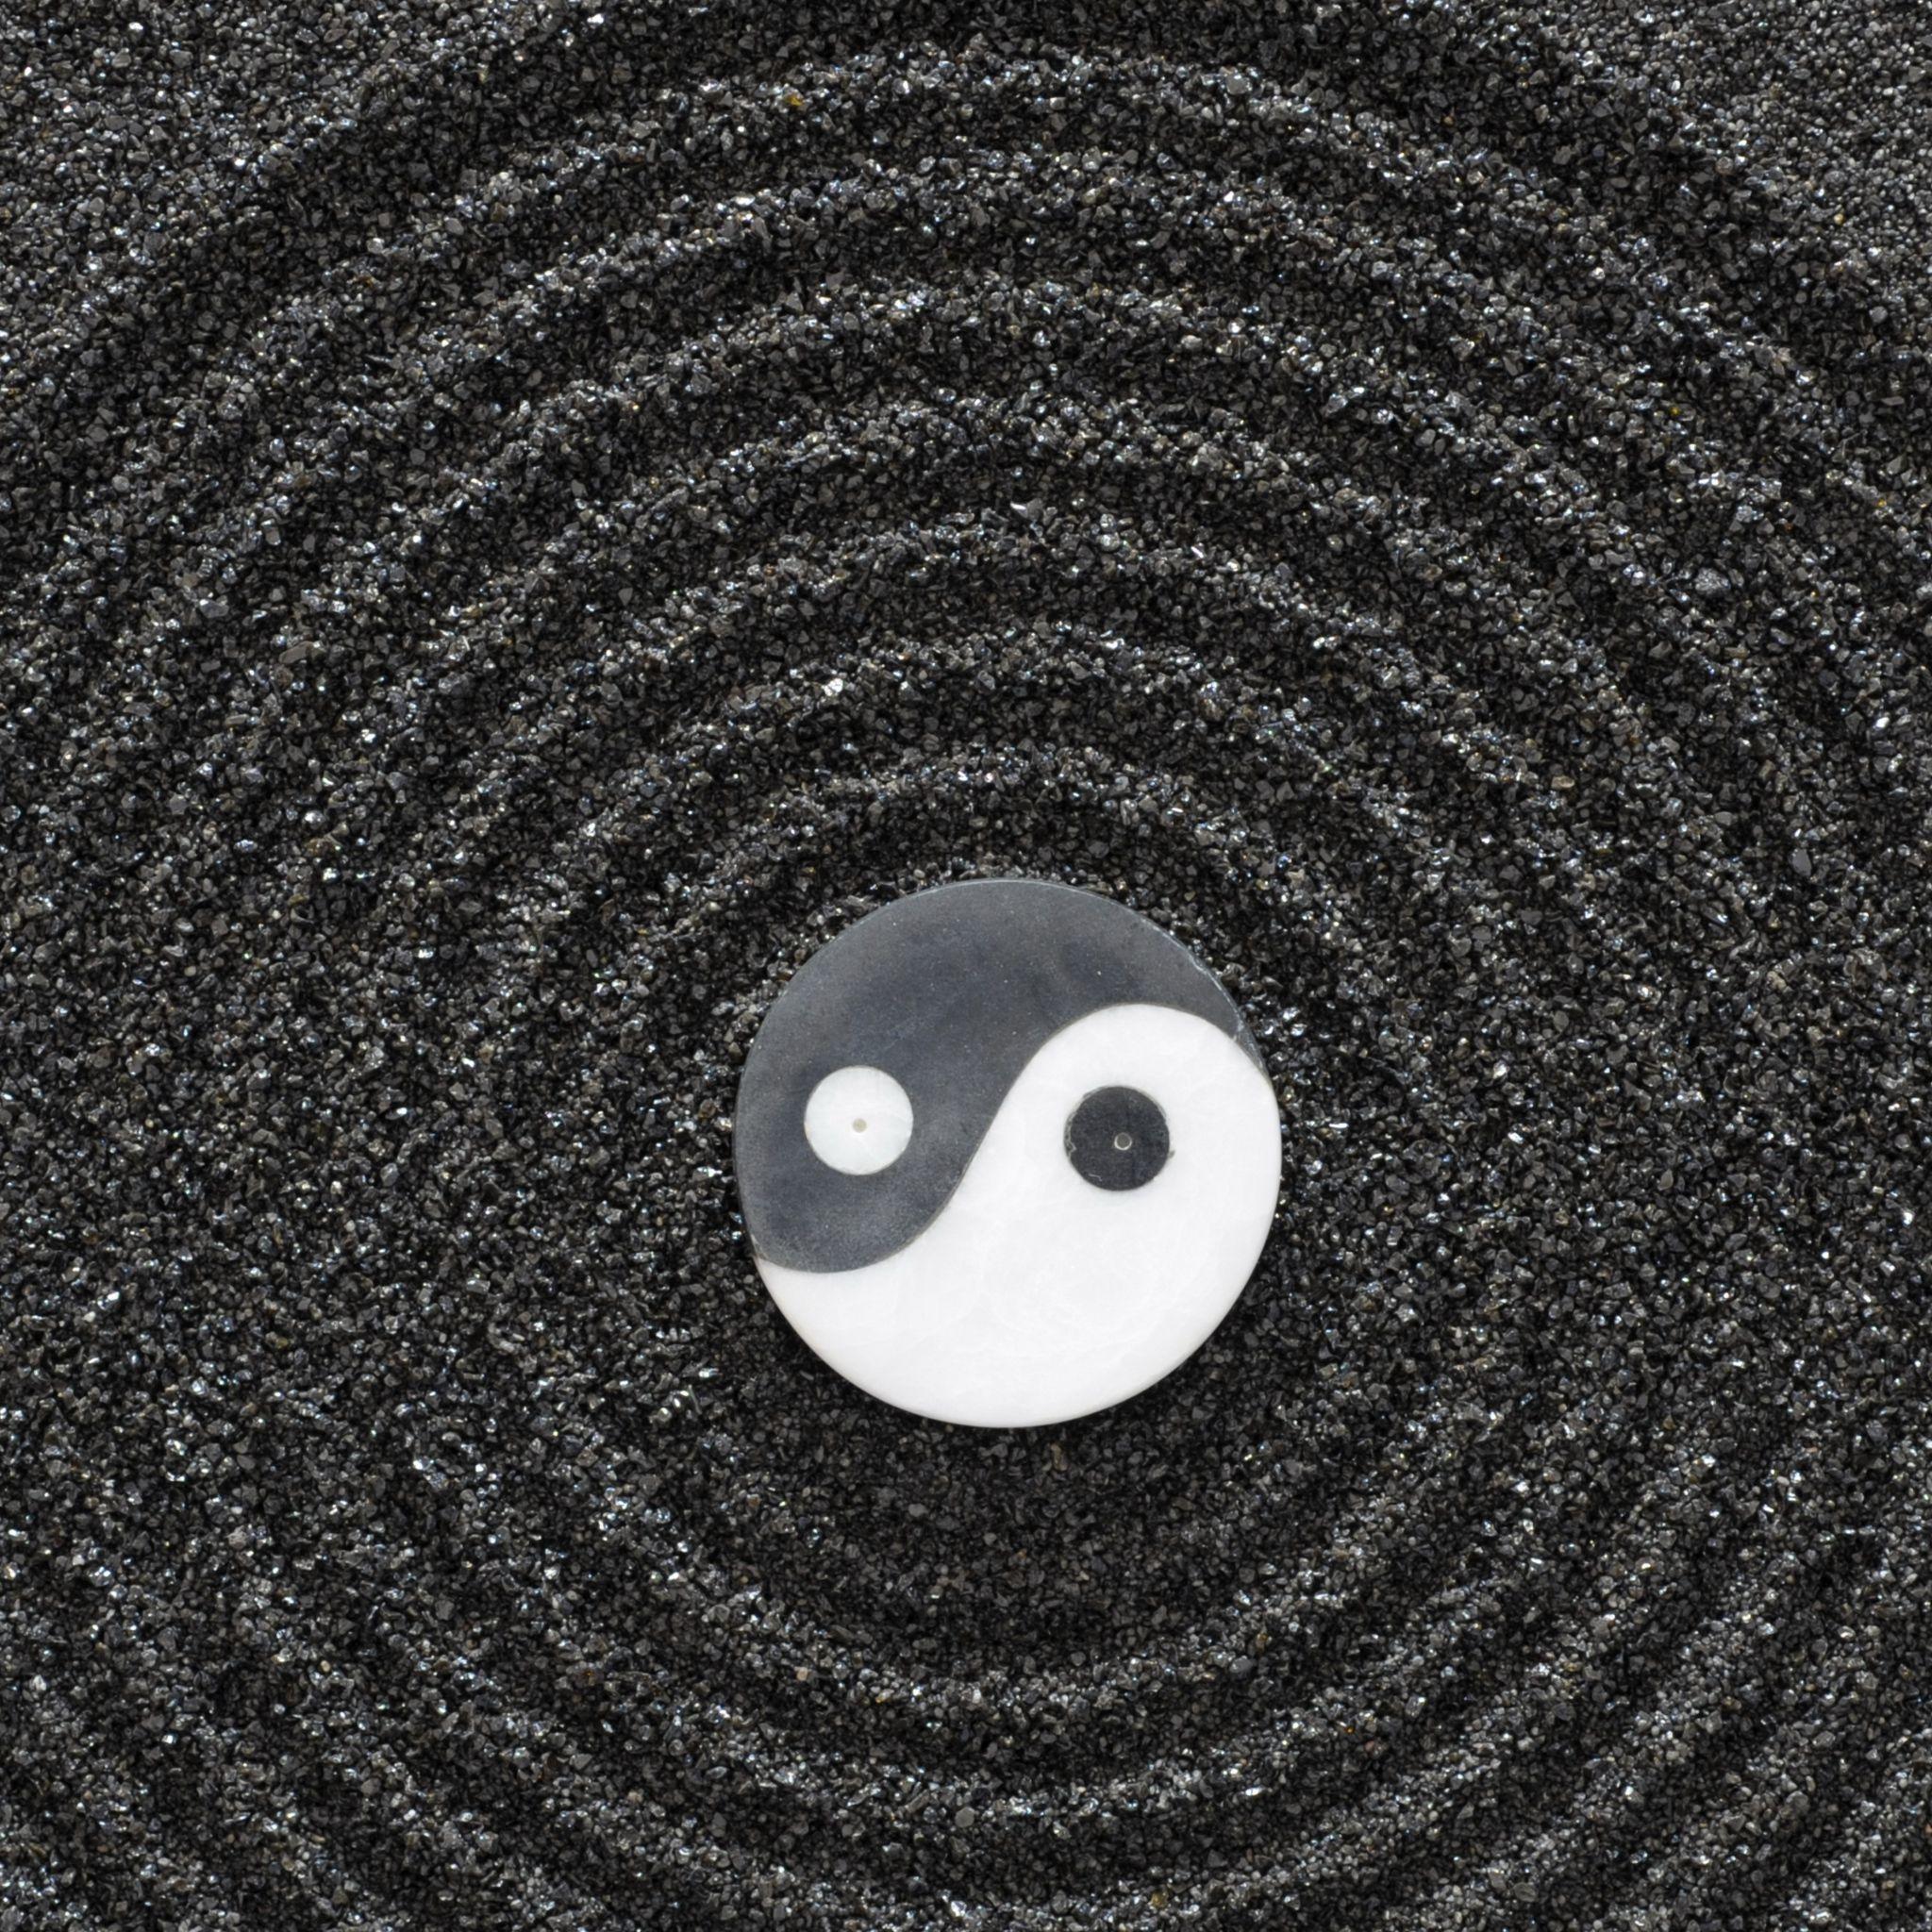 2048x2048 Wallpaper yinyang, stones, earth, symbol, harmony